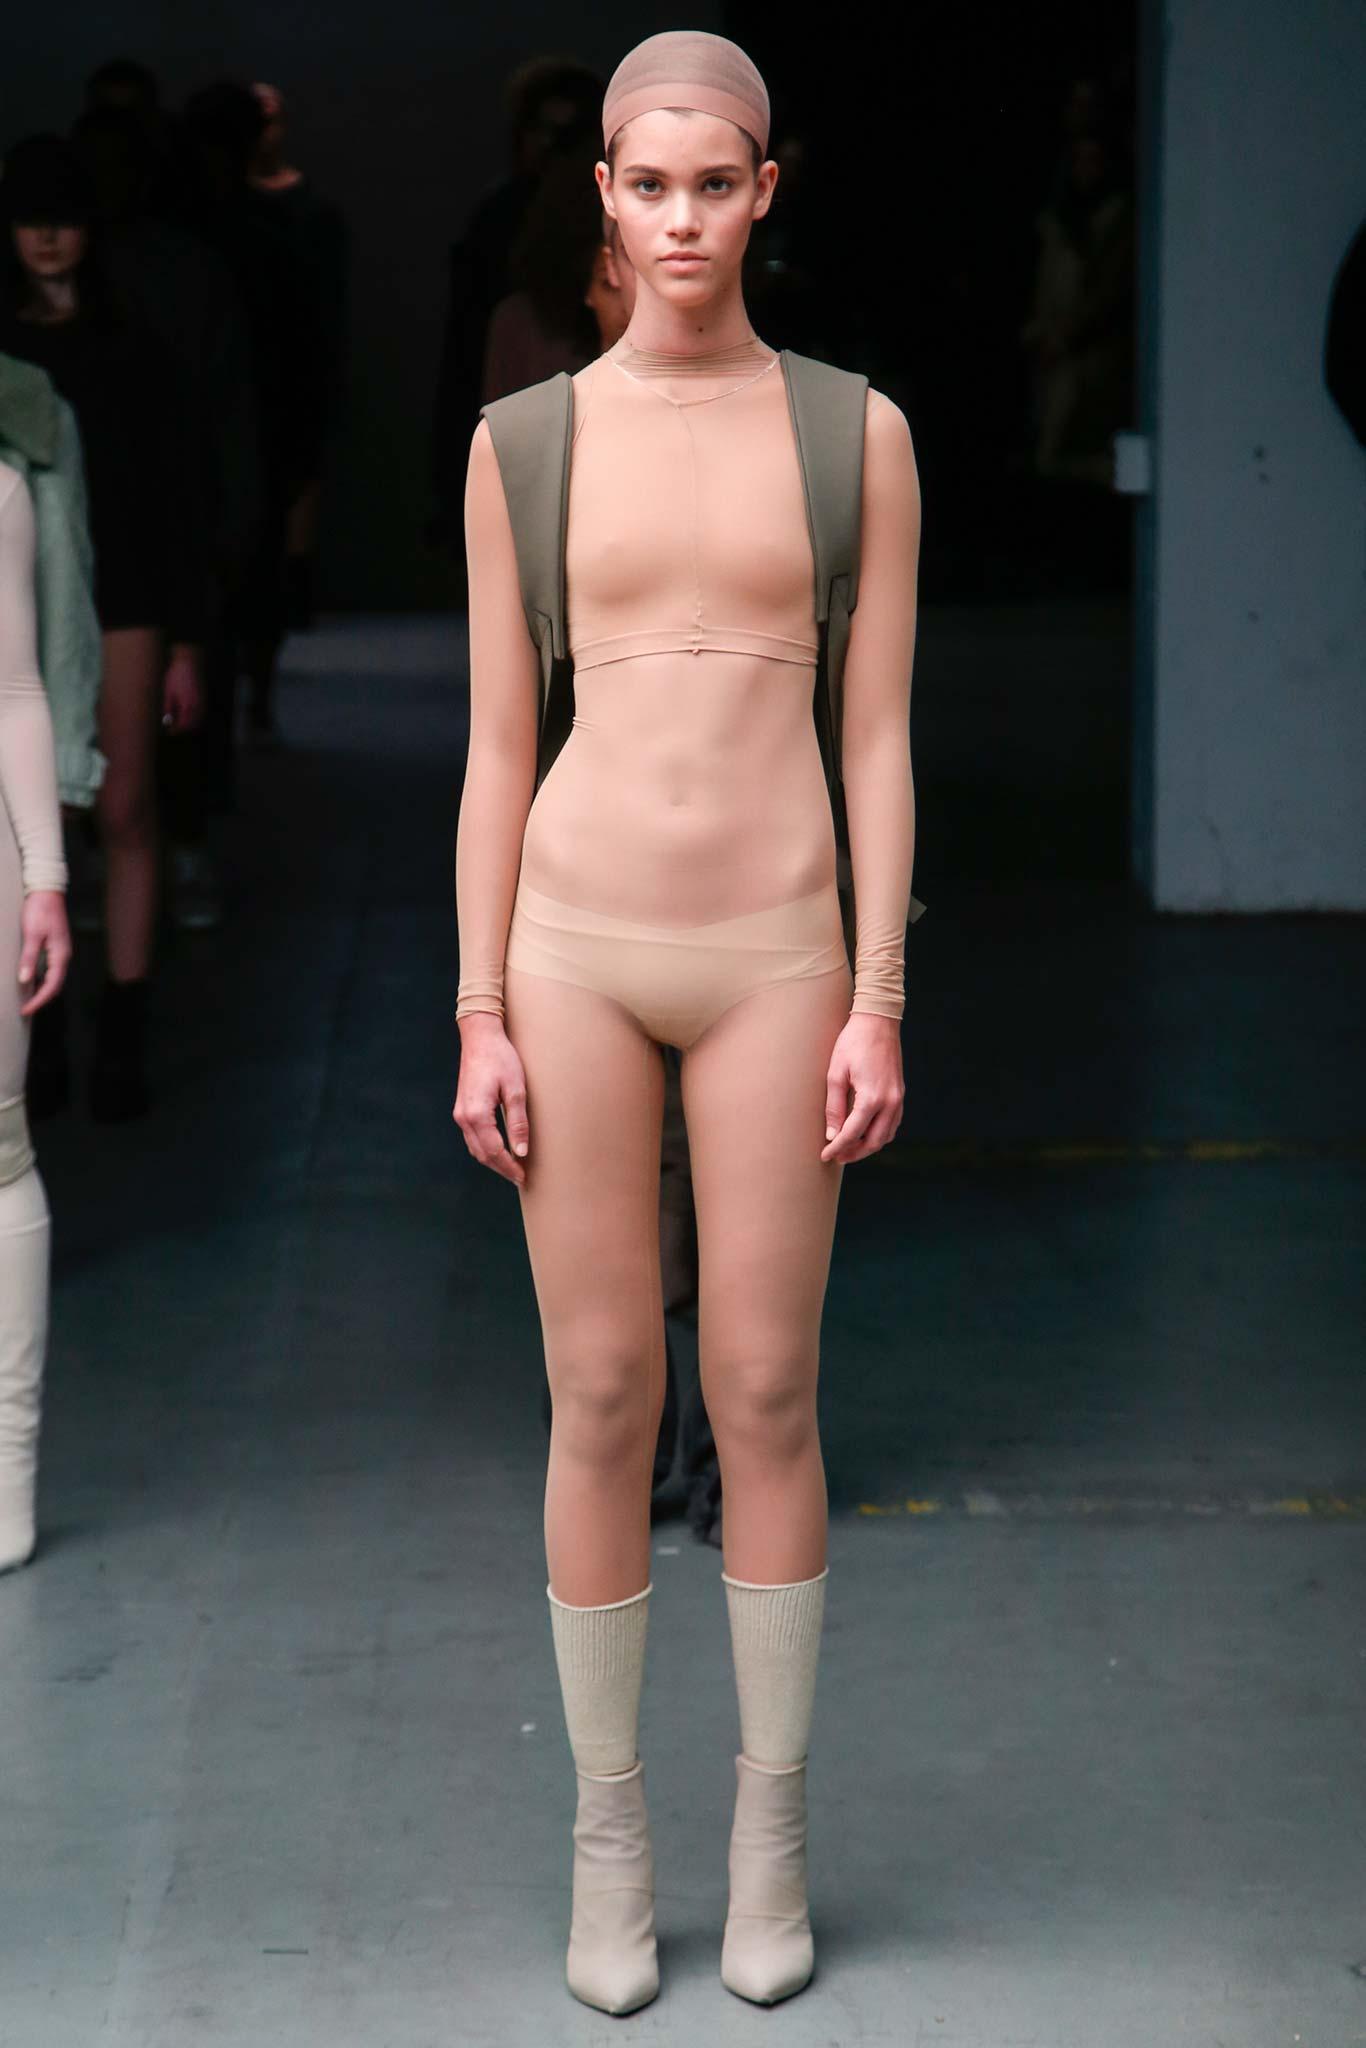 monique alexander голая фото